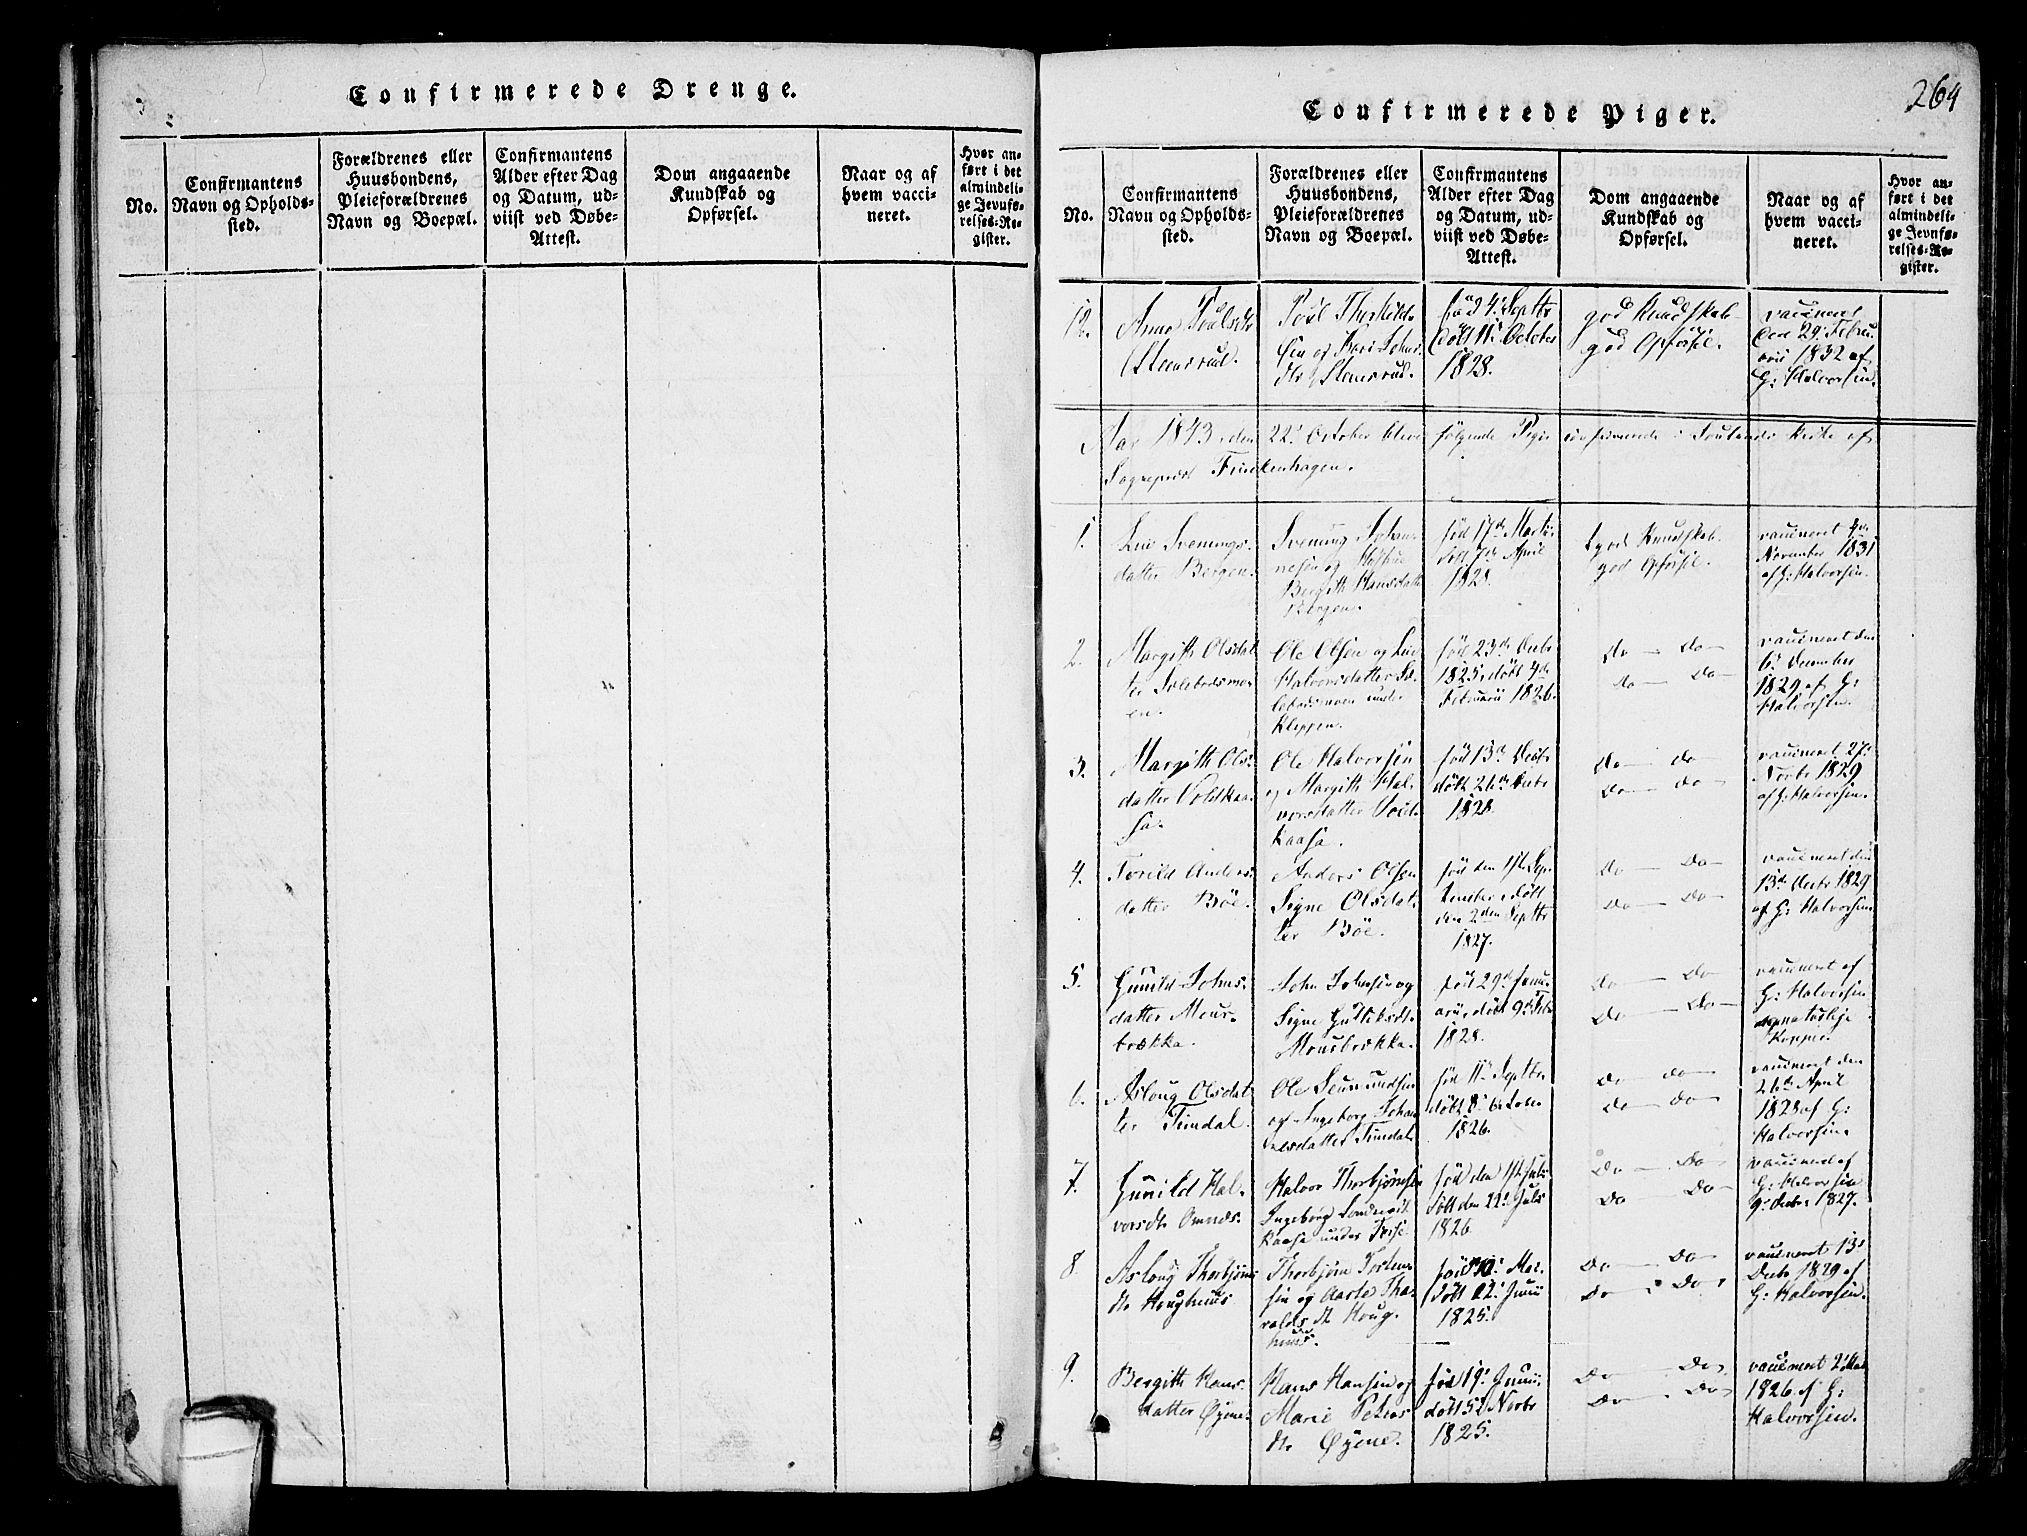 SAKO, Hjartdal kirkebøker, F/Fb/L0001: Ministerialbok nr. II 1, 1815-1843, s. 264